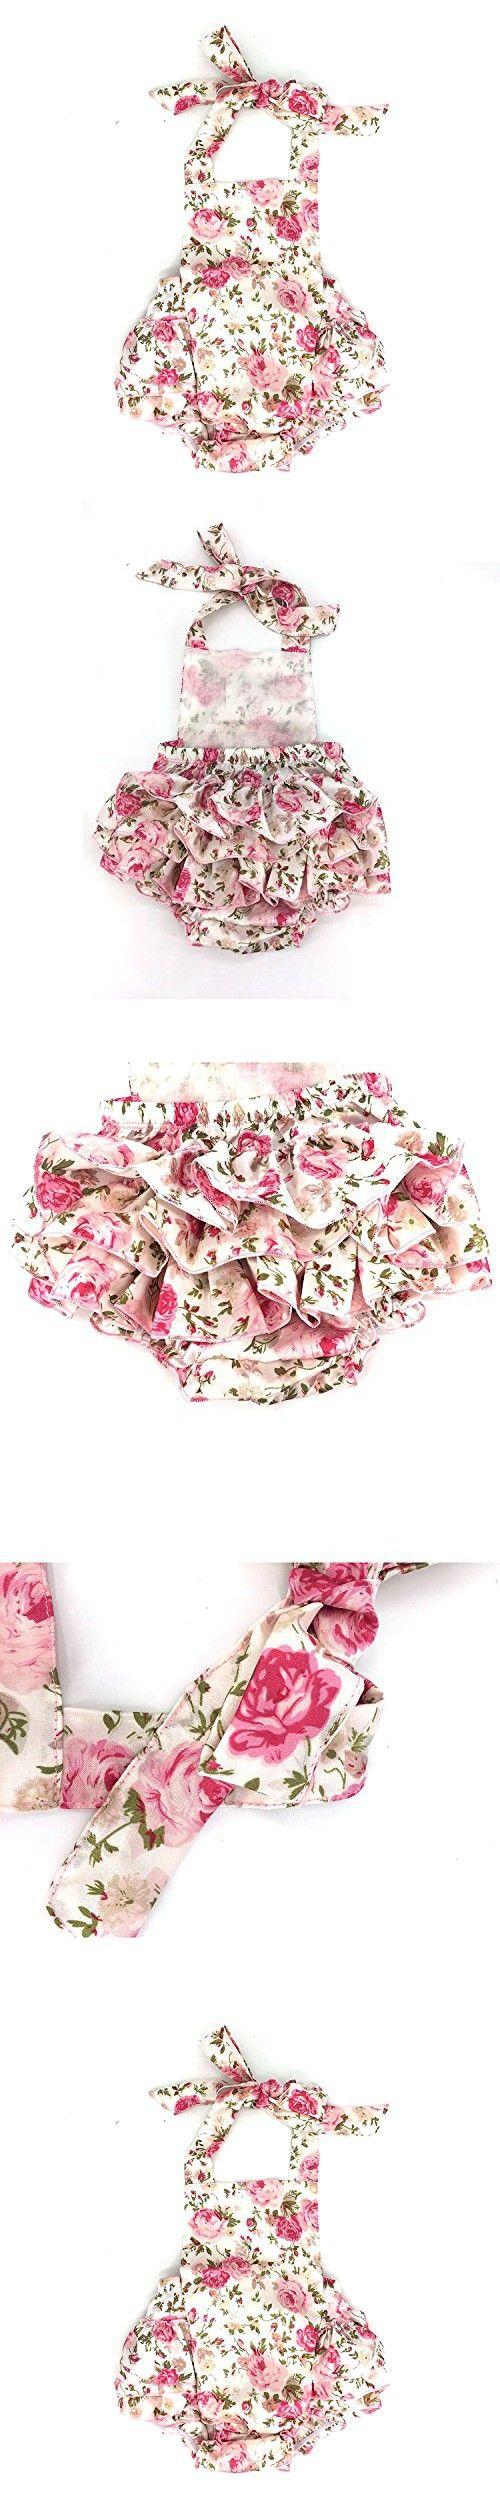 D.LIN Baby Girl's Ruffles Romper Dresses Summer Clothing